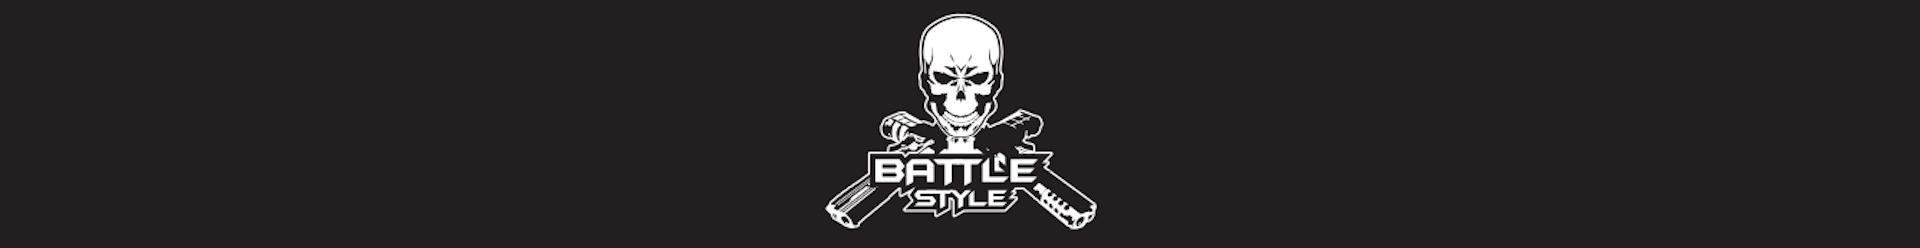 Battle Style